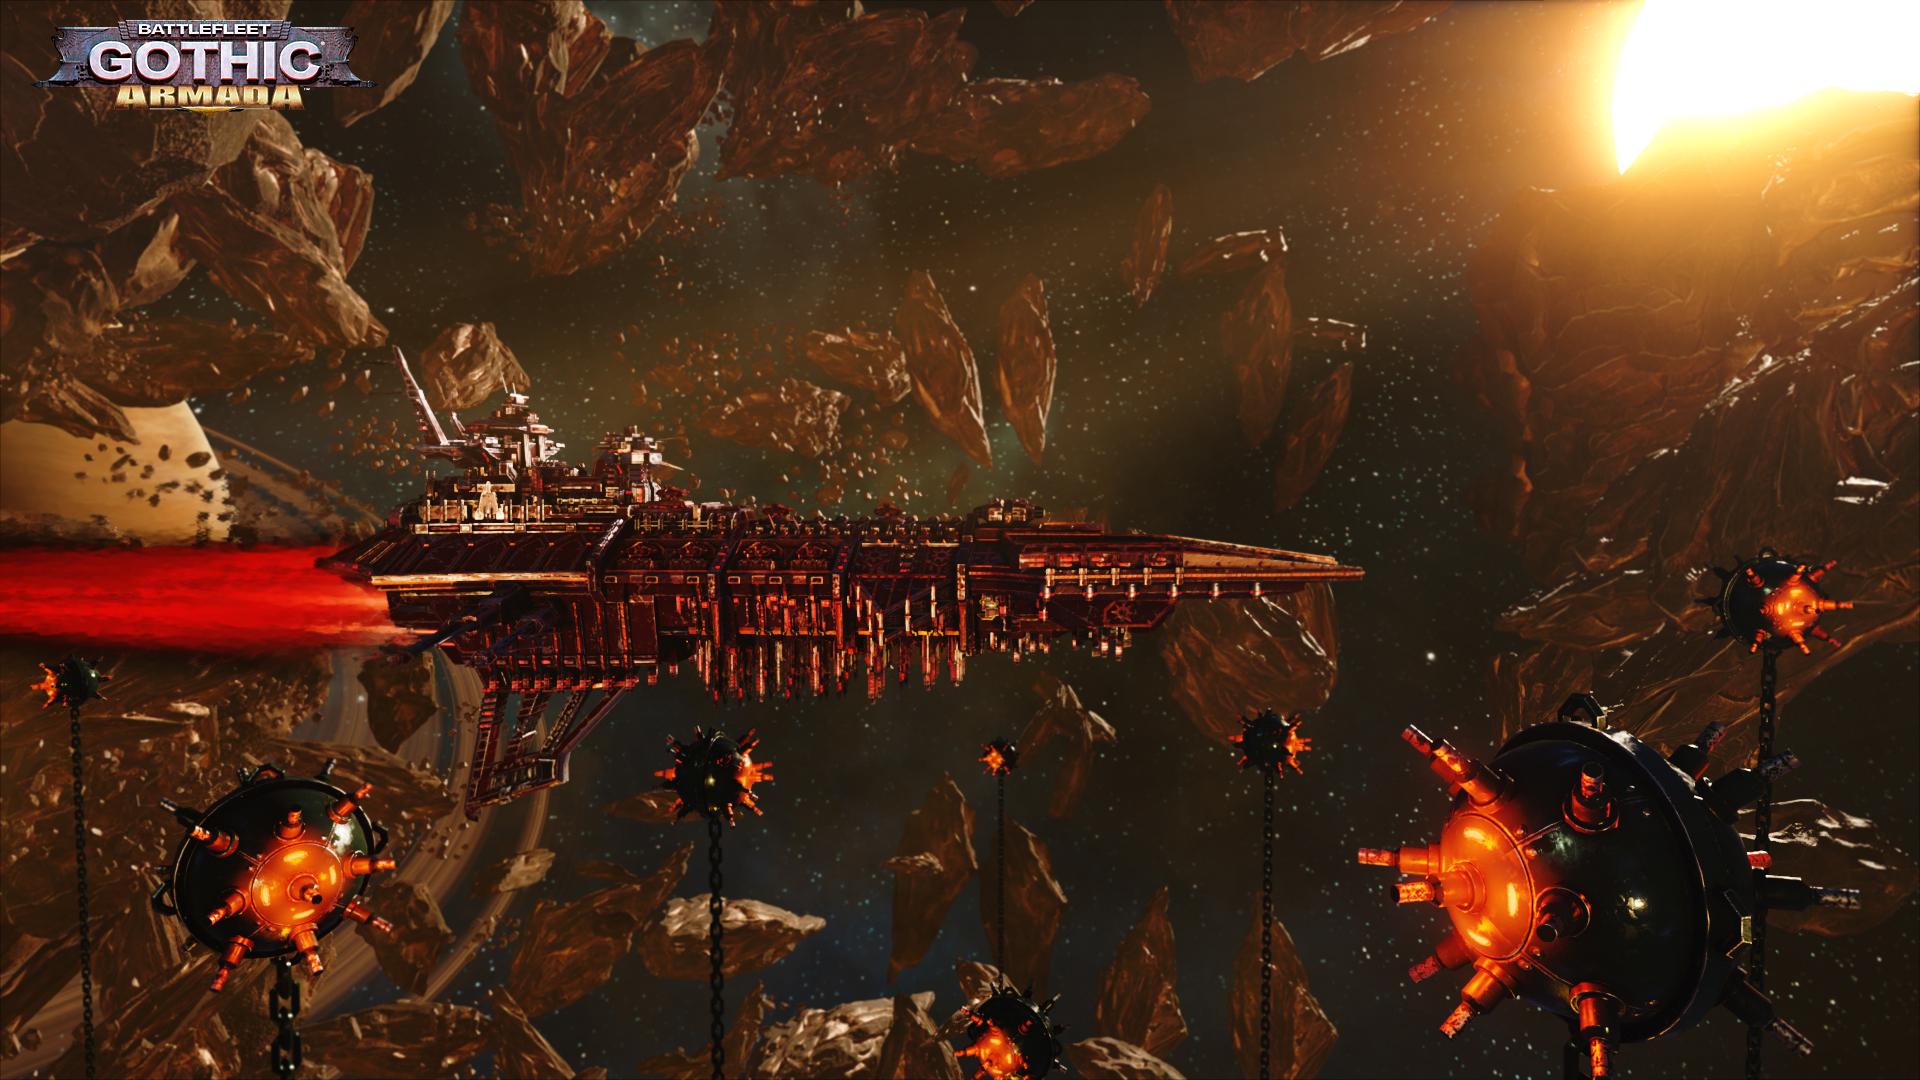 [Jeu vidéo] Battlefleet Gothic : Armada - Page 2 1433846605-3275-capture-d-ecran-pc